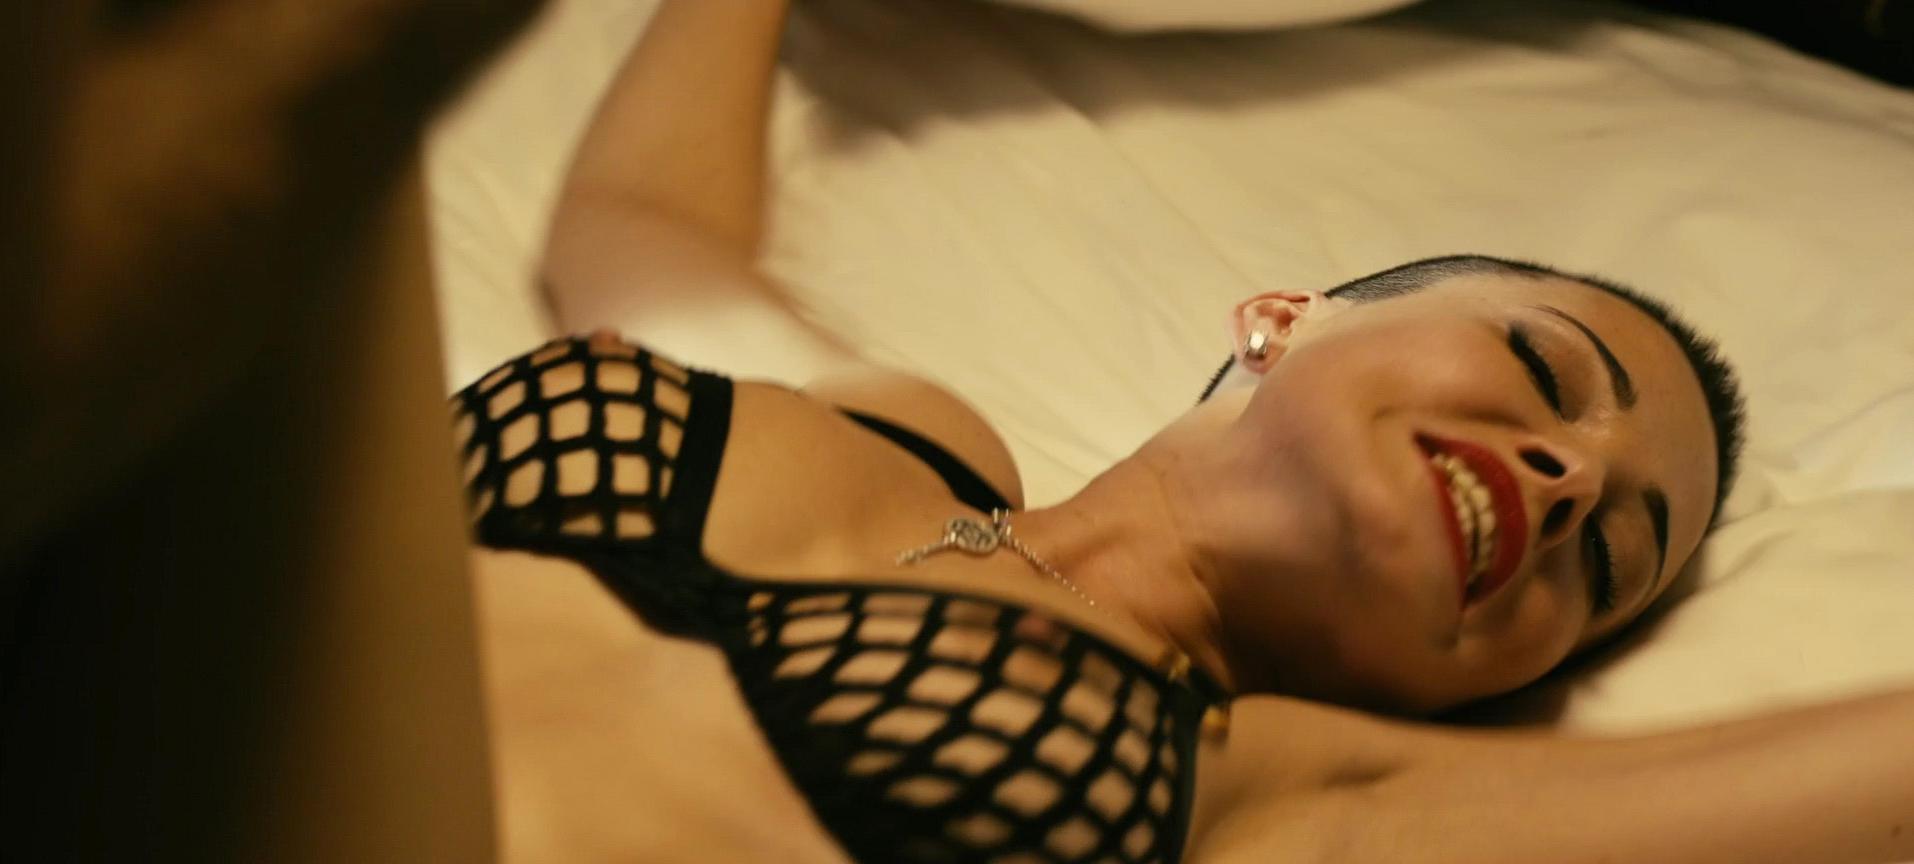 Dasha Astafieva nude - Chto tvoryat muzchiny (2013)